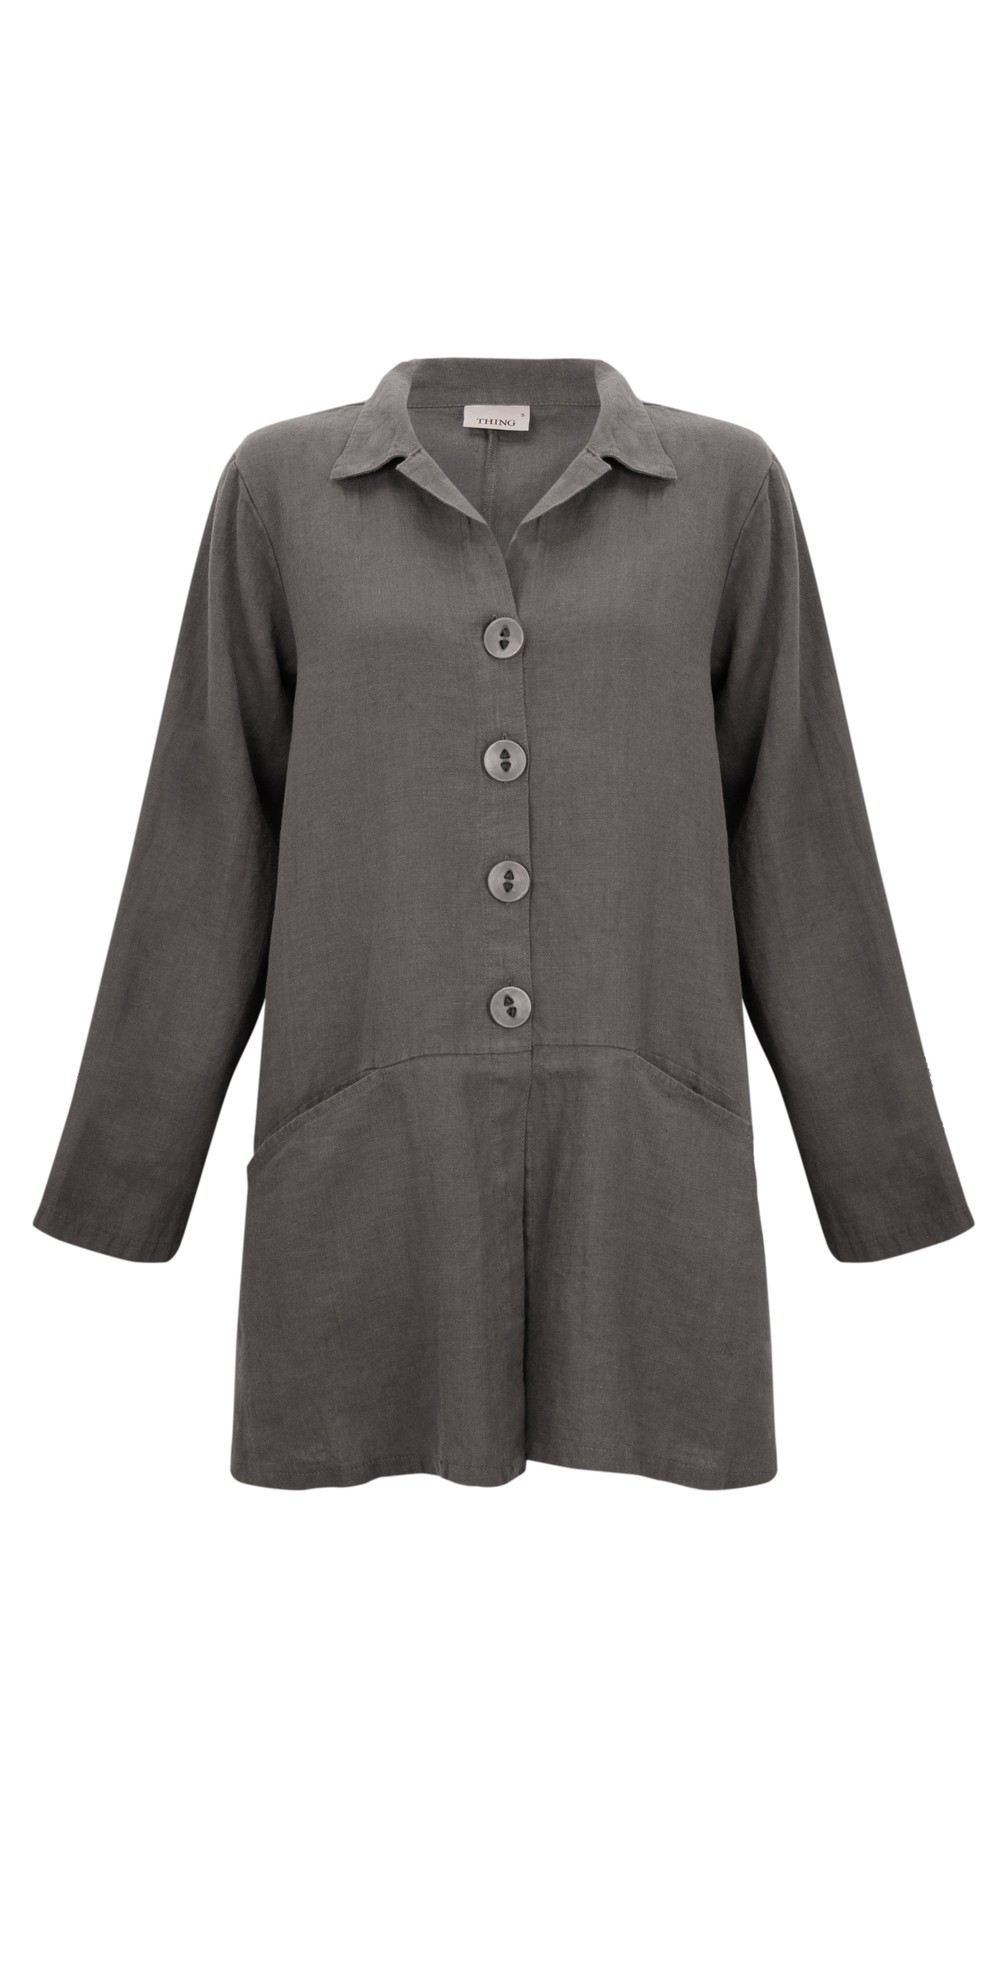 Jet Pocket Winter Linen Jacket main image